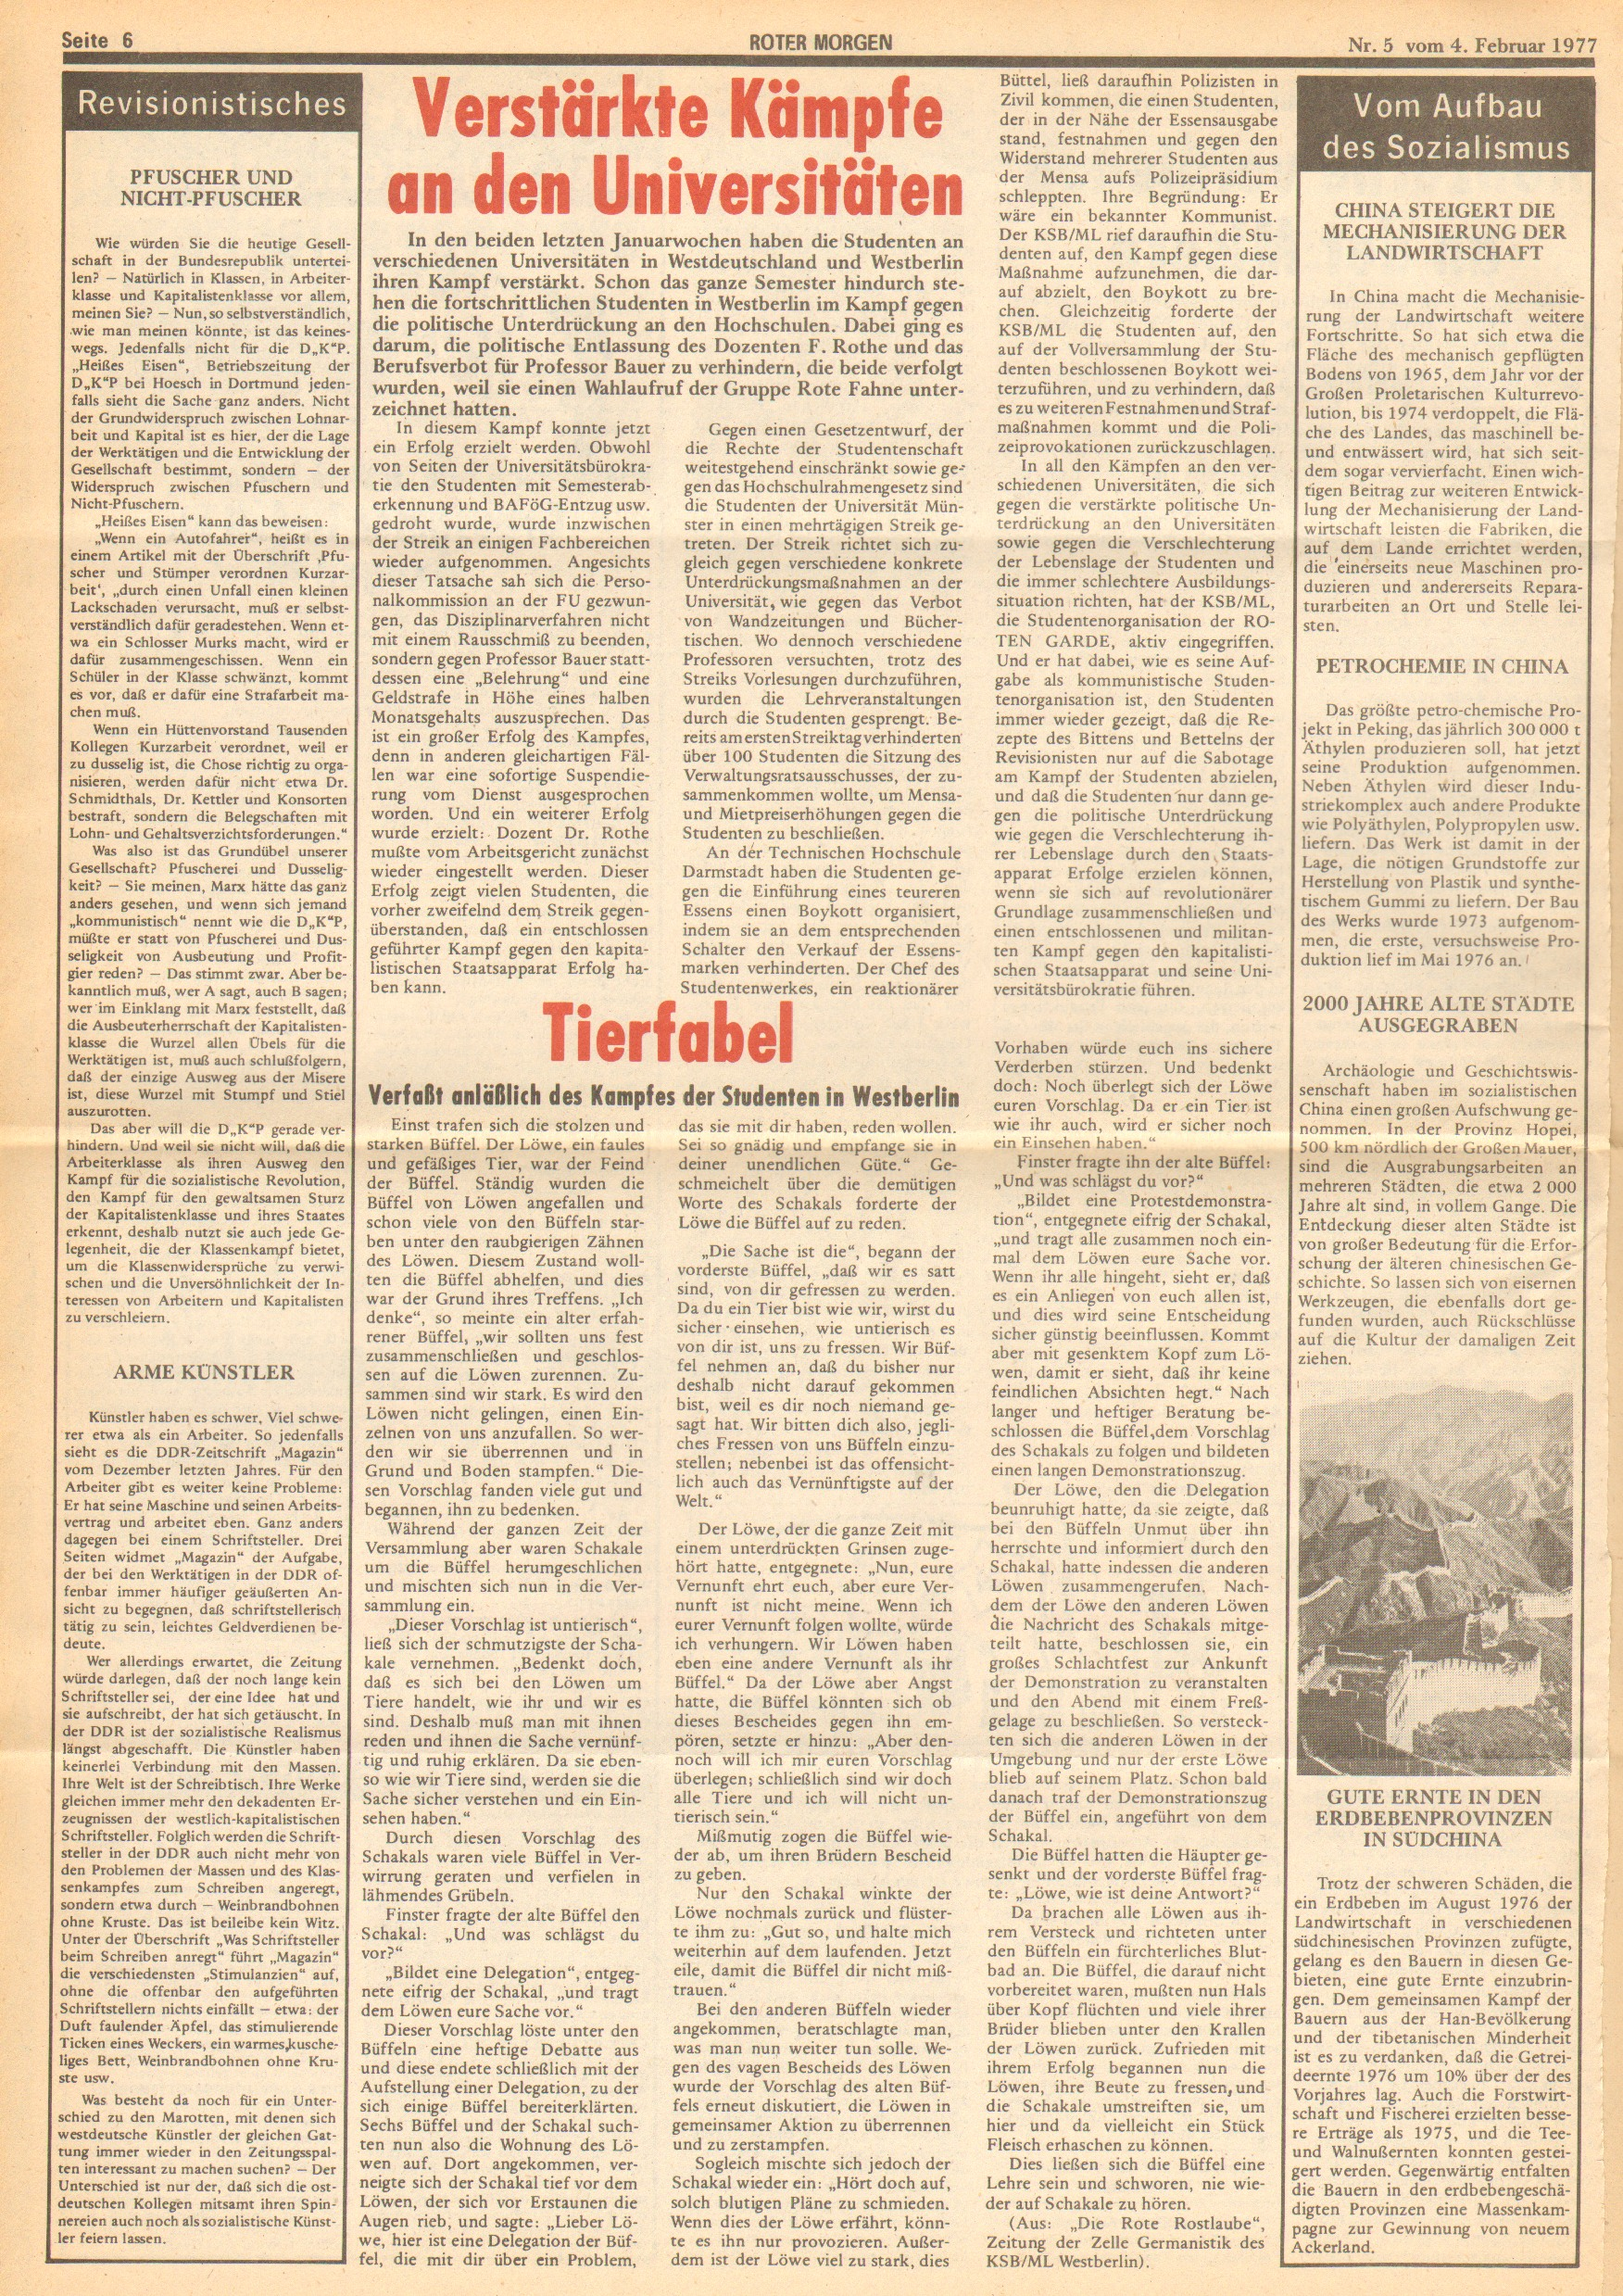 Roter Morgen, 11. Jg., 4. Februar 1977, Nr. 5, Seite 6